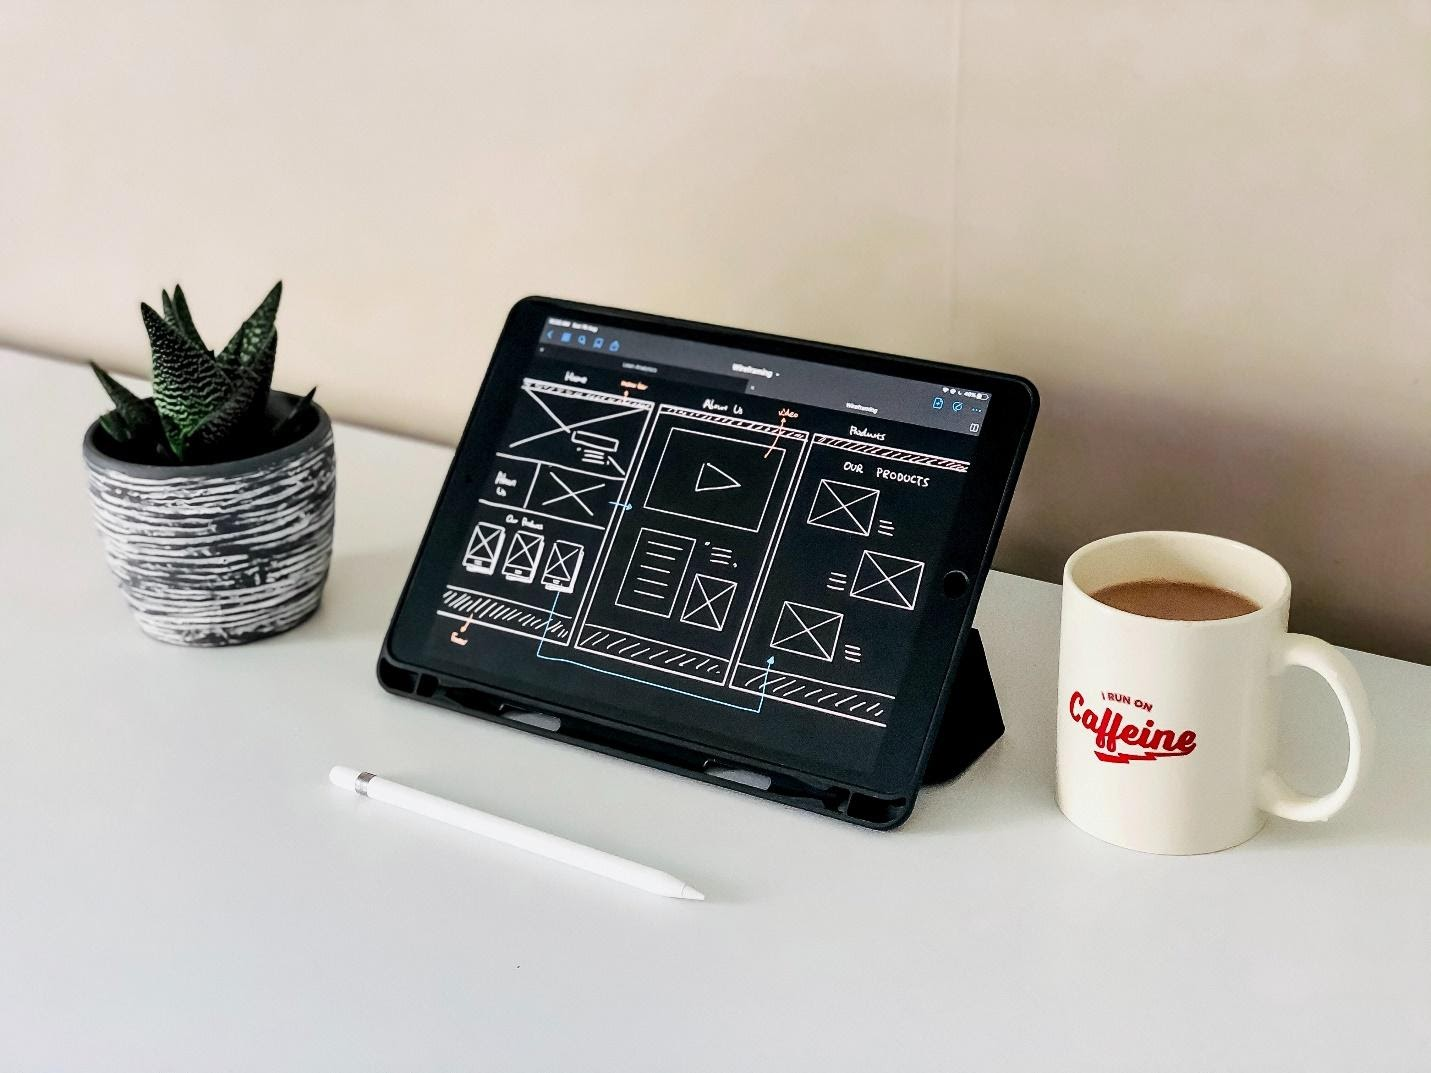 8 Website Design Practices to Follow